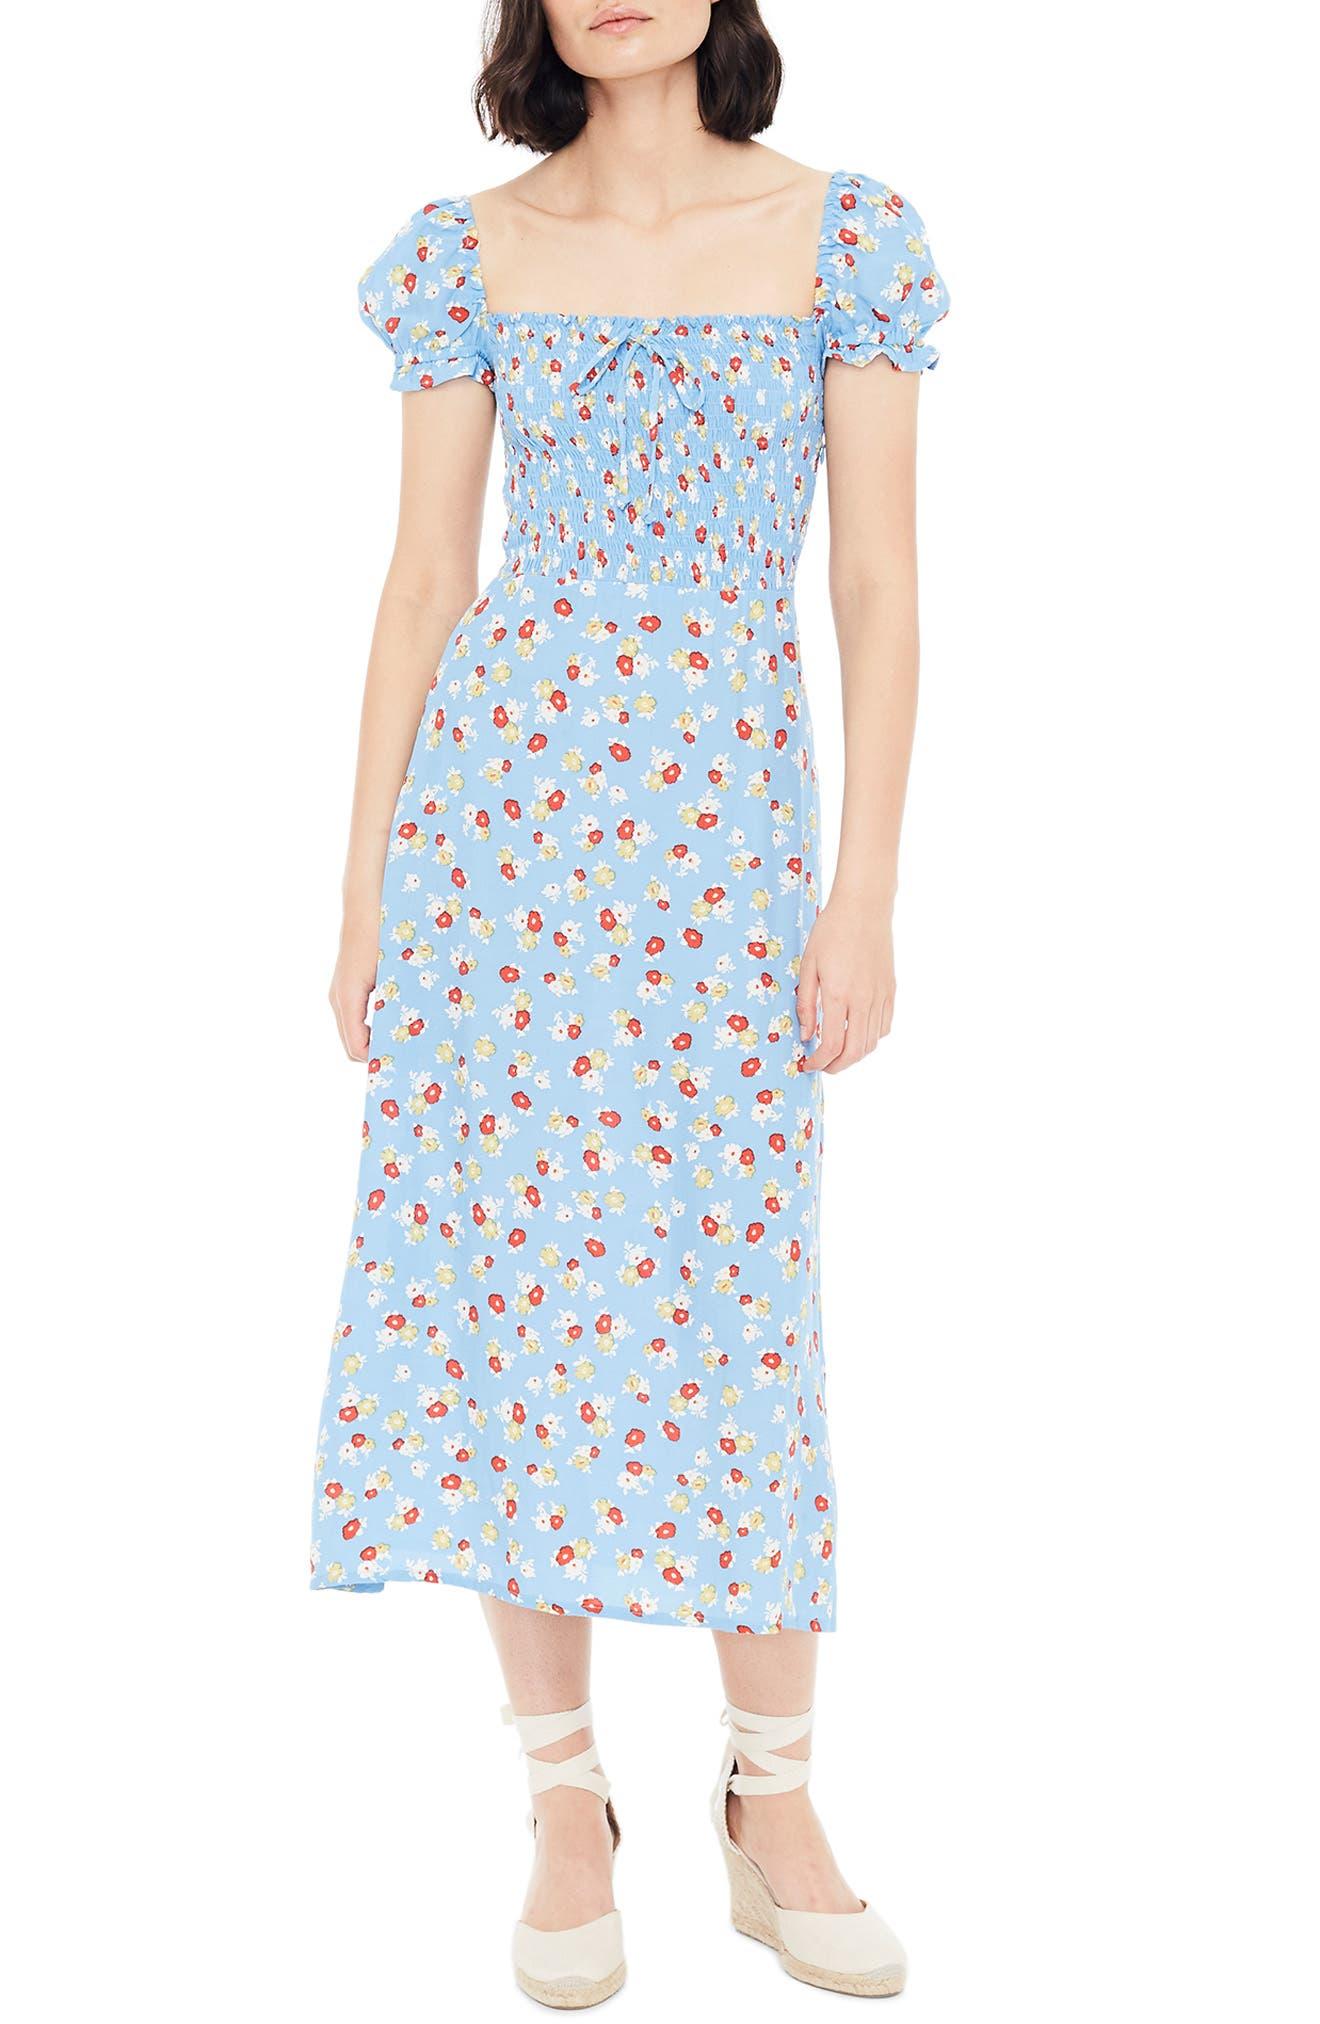 FAITHFULL THE BRAND, Castilo Jasmin Midi Dress, Alternate thumbnail 5, color, JASMIN FLORAL PRINT - BLUE